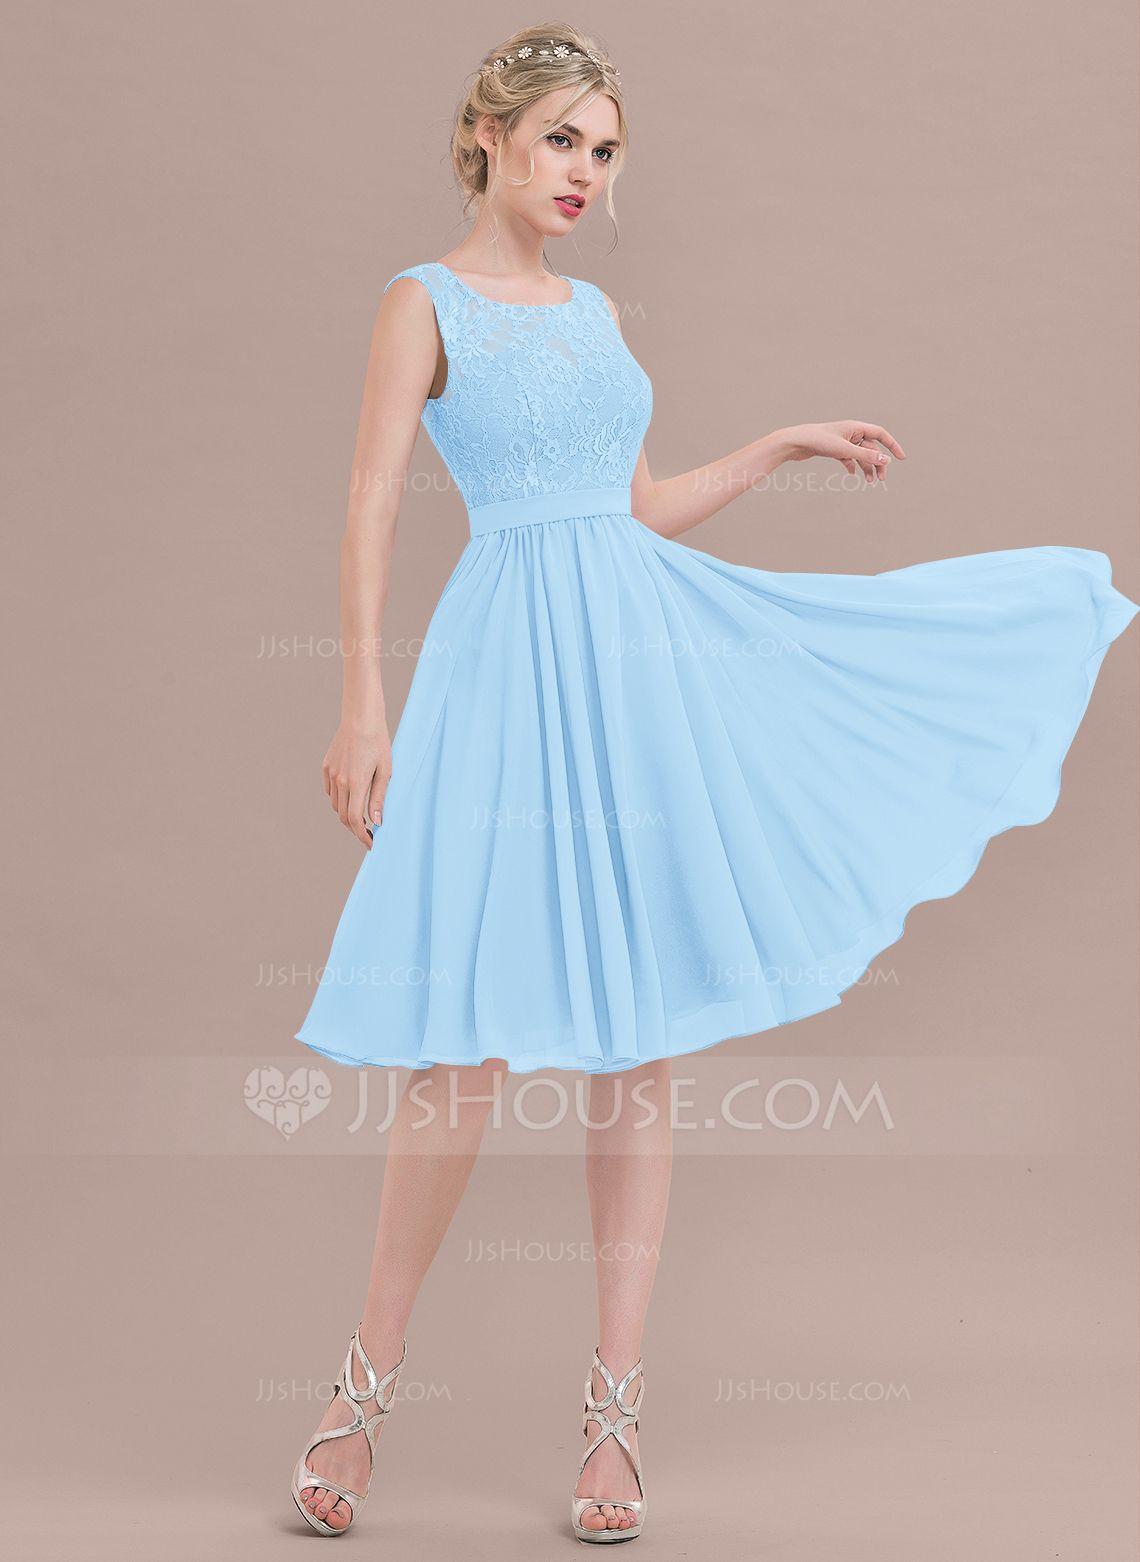 Alineprincess square neckline kneelength chiffon lace bridesmaid